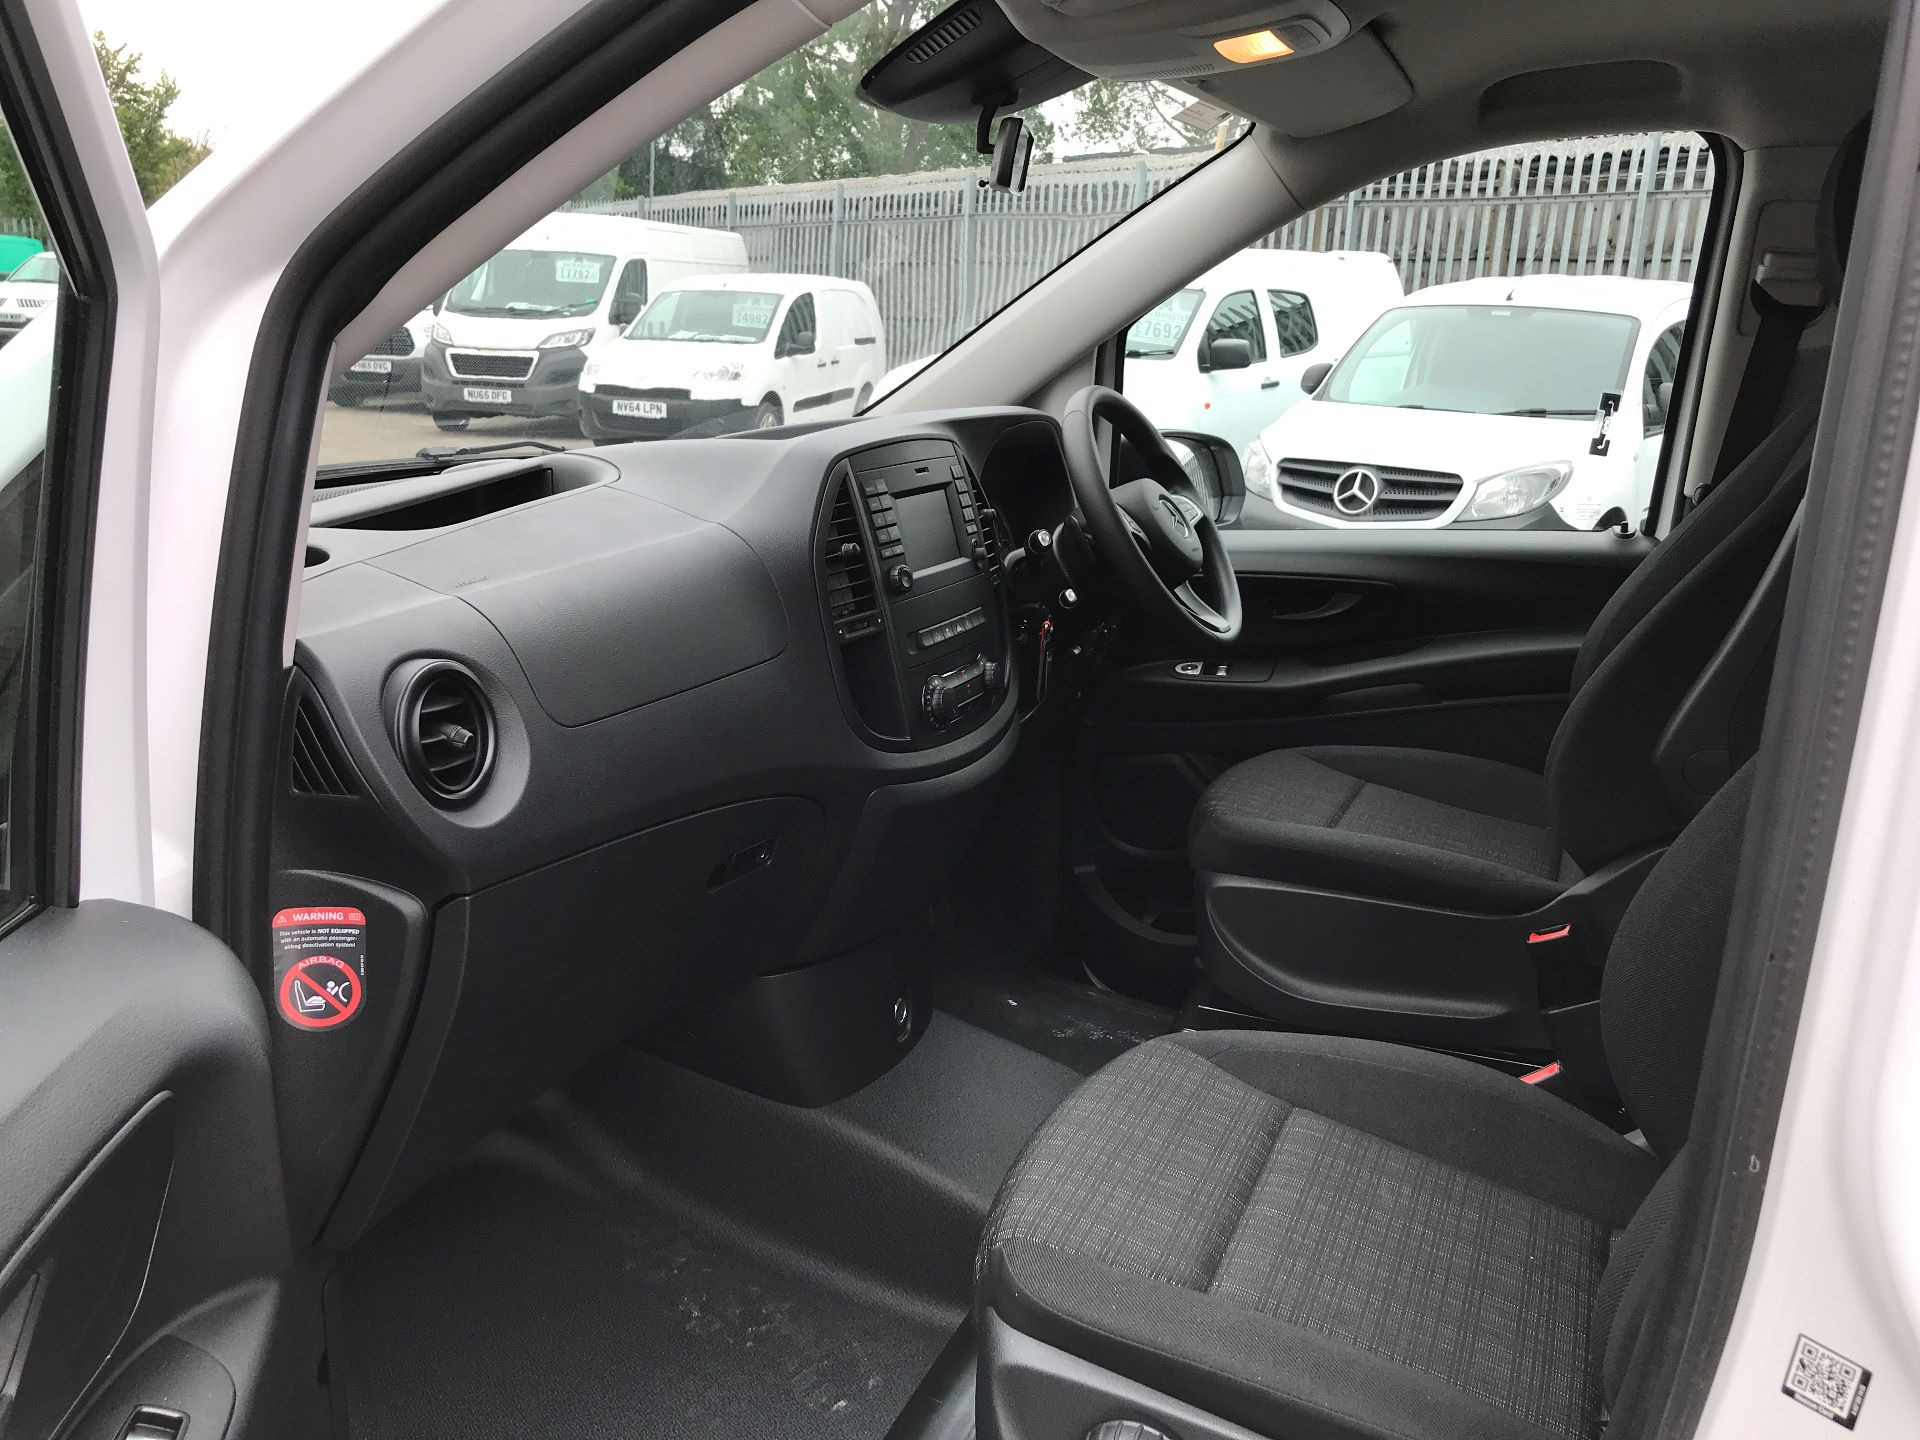 2018 Mercedes-Benz Vito 119CDI COMPACT BLUETECH 190PS DUALINER SPORT AUTOMATIC EURO 6 (YS18KAJ) Image 11